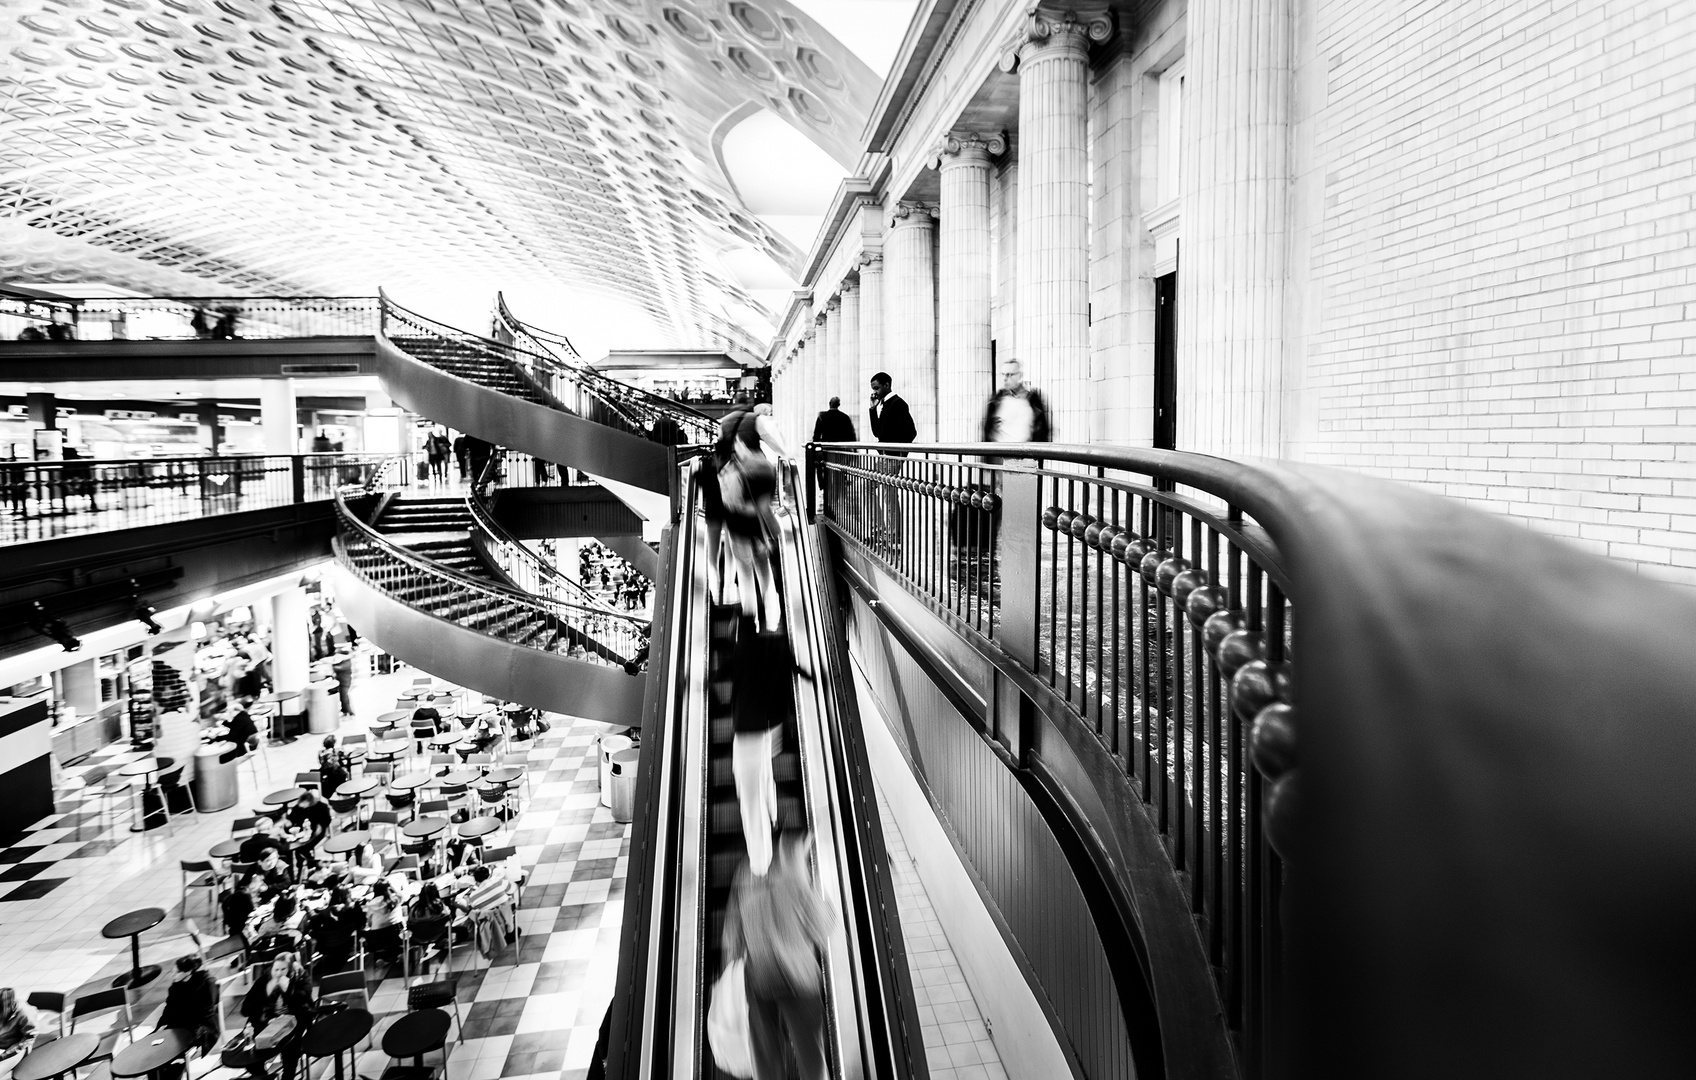 Union Station Shopping Mall Washington